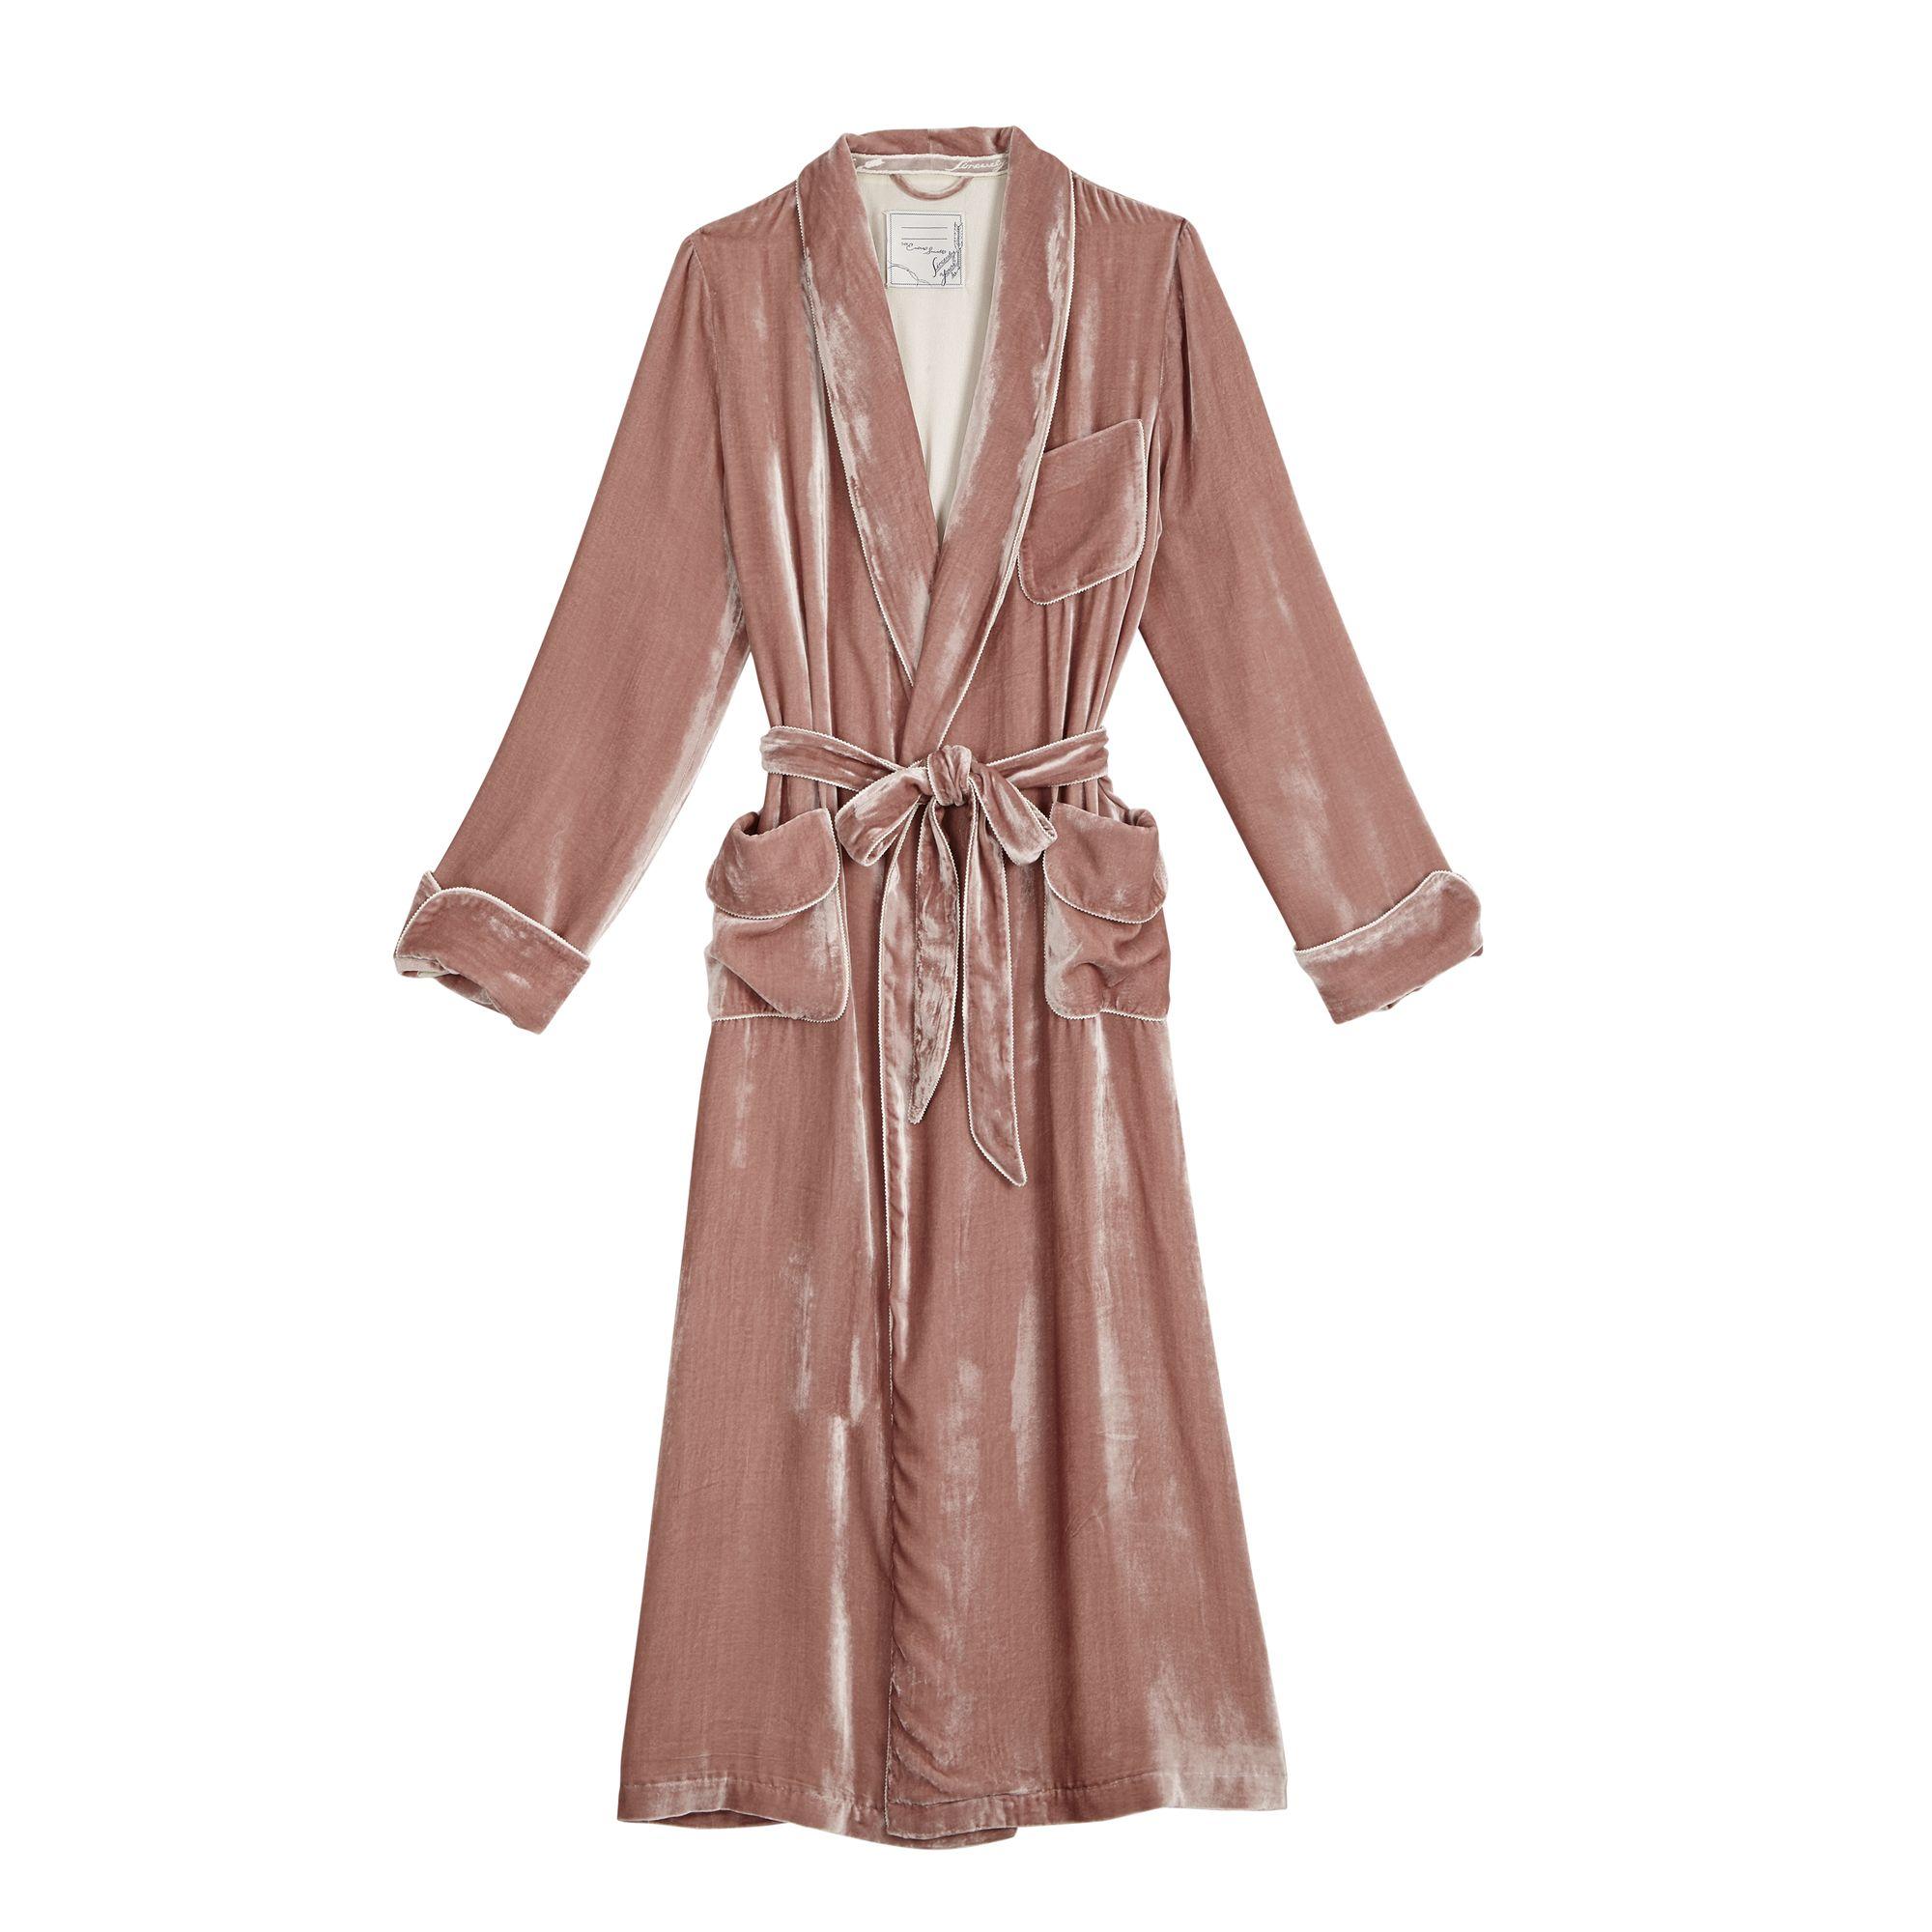 Uni Robe woven Main Silk Lining Silk